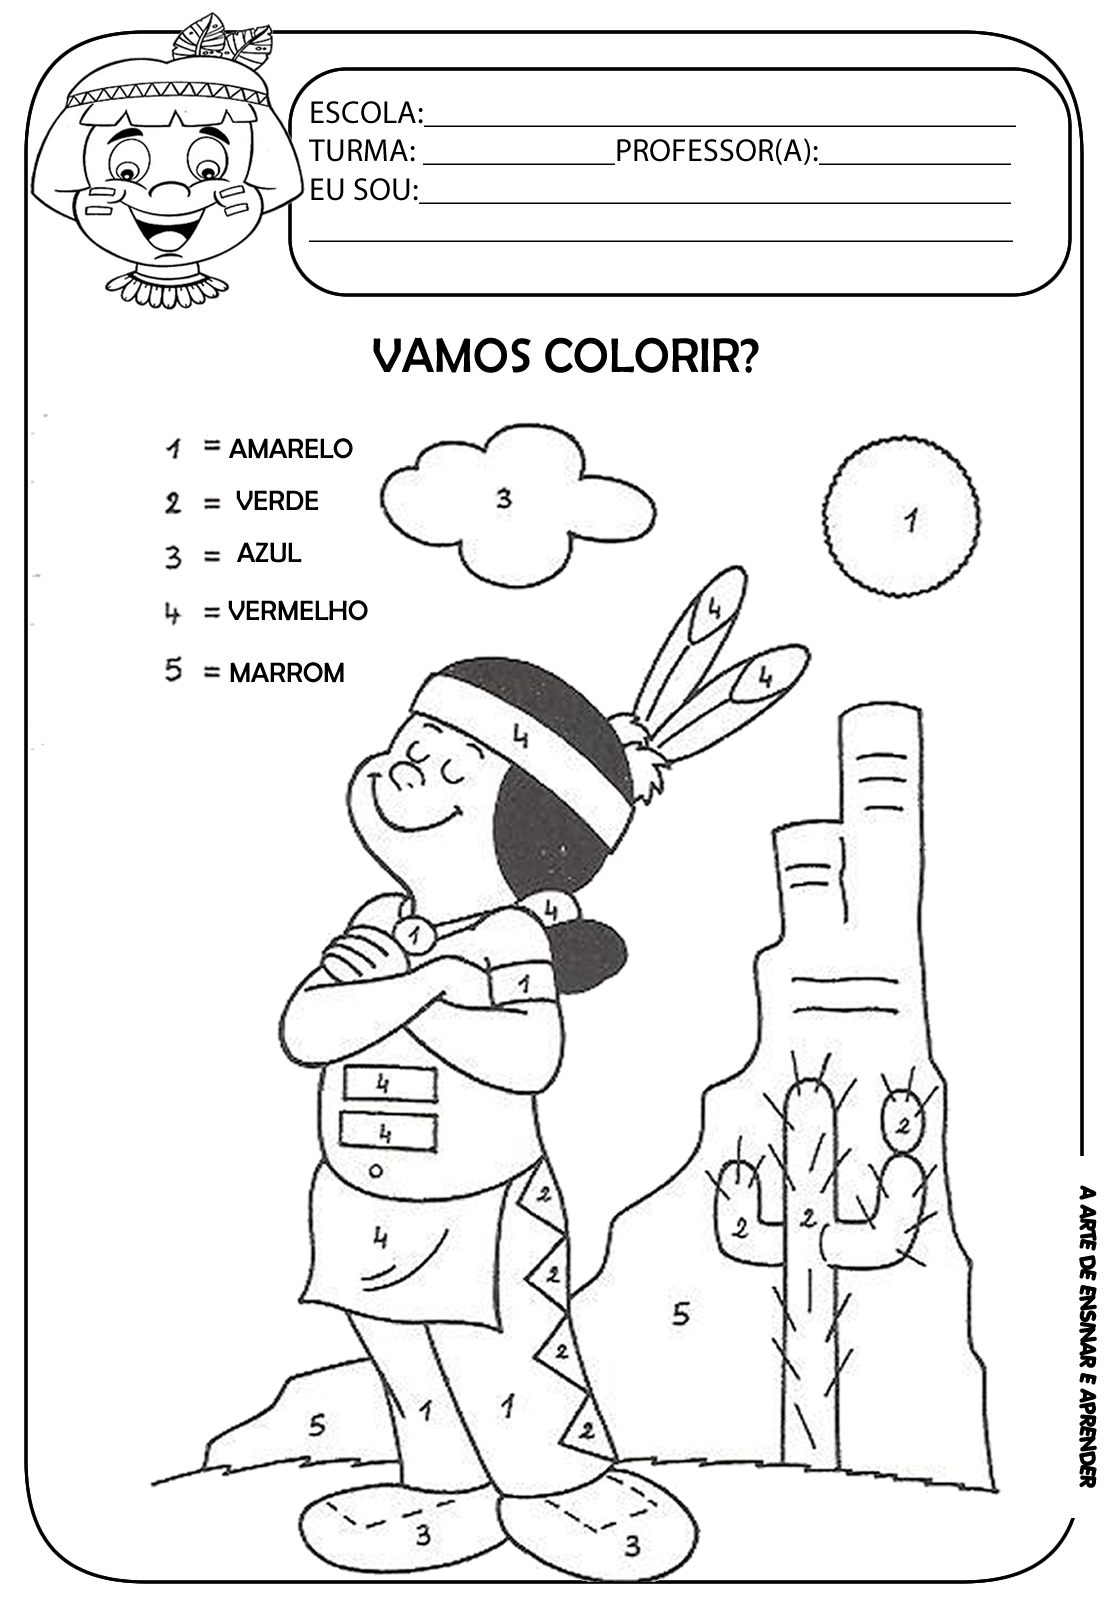 Atividades Indios Colorir De Acordo Ao Numeral Atividade Dia